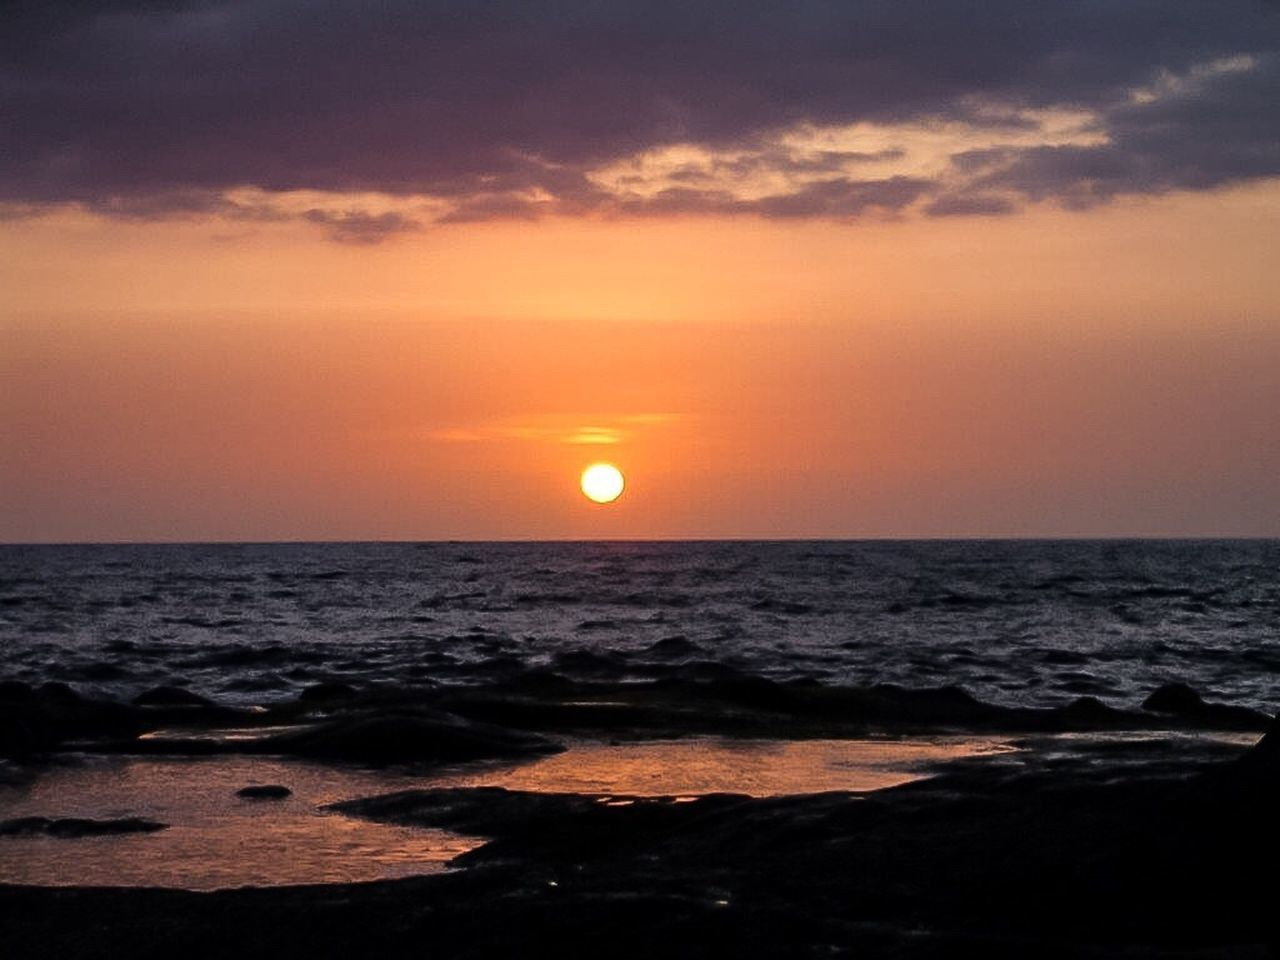 sunset, sea, sun, beauty in nature, scenics, horizon over water, orange color, sky, nature, tranquil scene, tranquility, idyllic, water, horizon, no people, outdoors, beach, cloud - sky